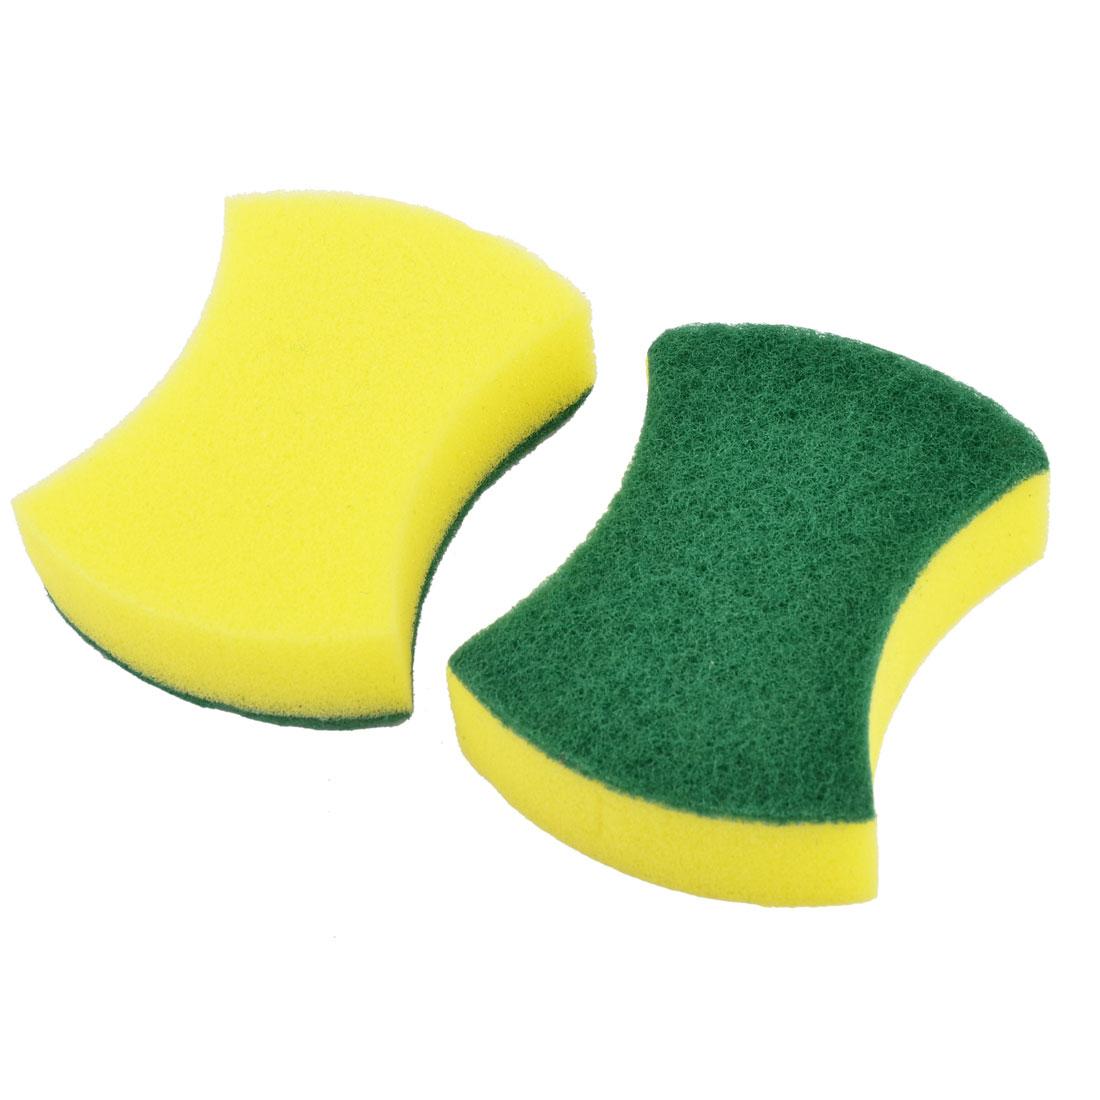 Home Sponge Bowl Plate Washing Tool Pot Pan Dishes Cleaning Pad Brush 2pcs